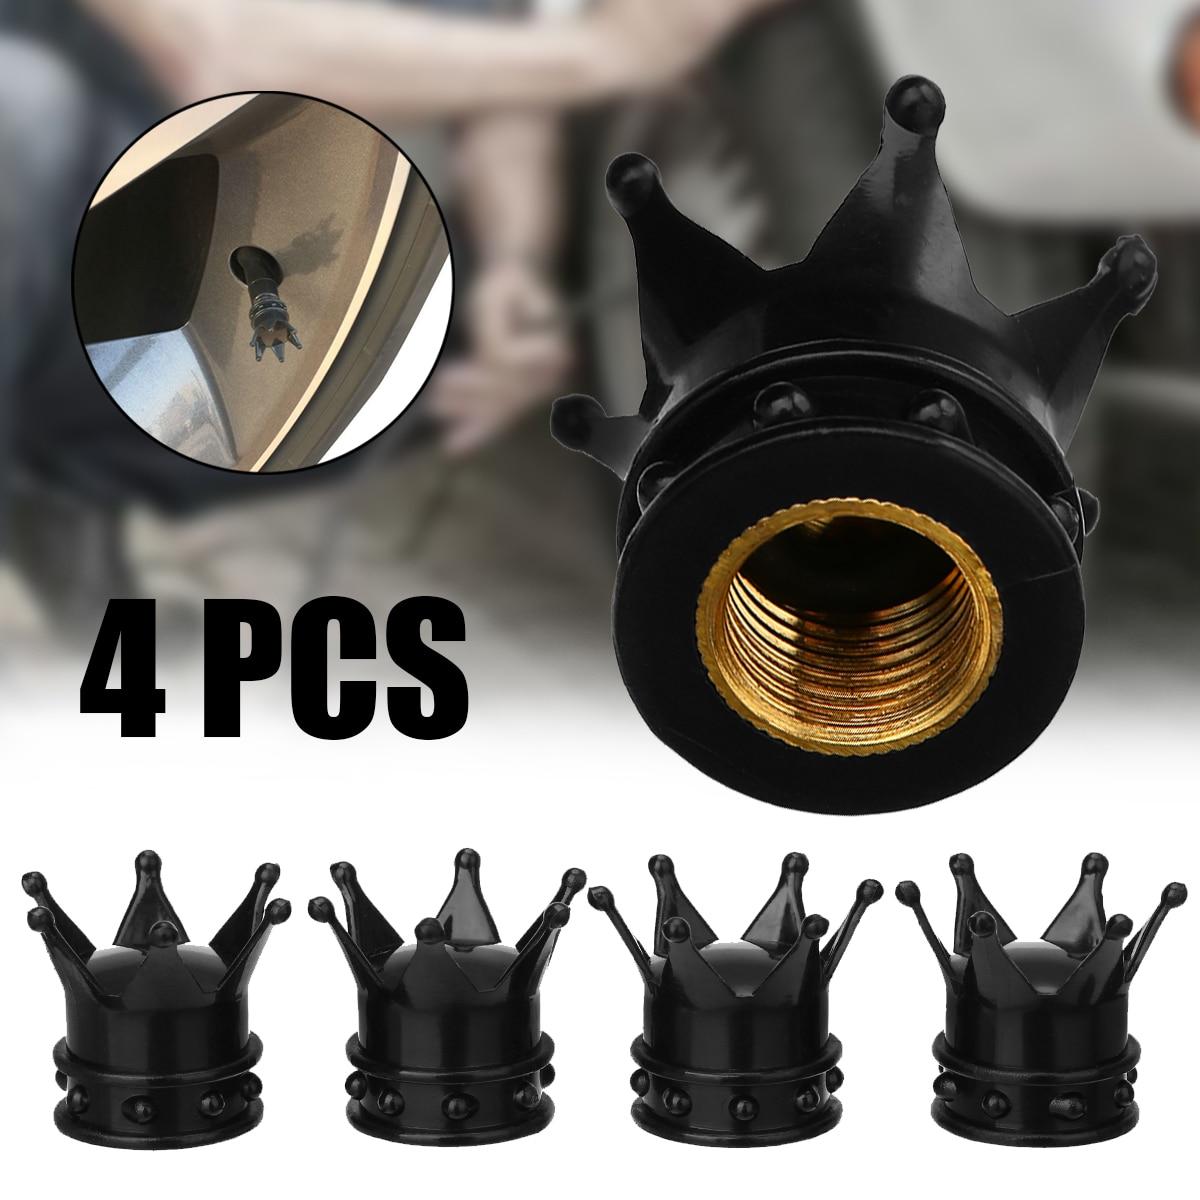 Treyues 4Pcs/set Universal Black Crown Style Car Tire Air Valve Stem Cap Automobiles Wheel Tyre Stem Air Valve Dust Covers